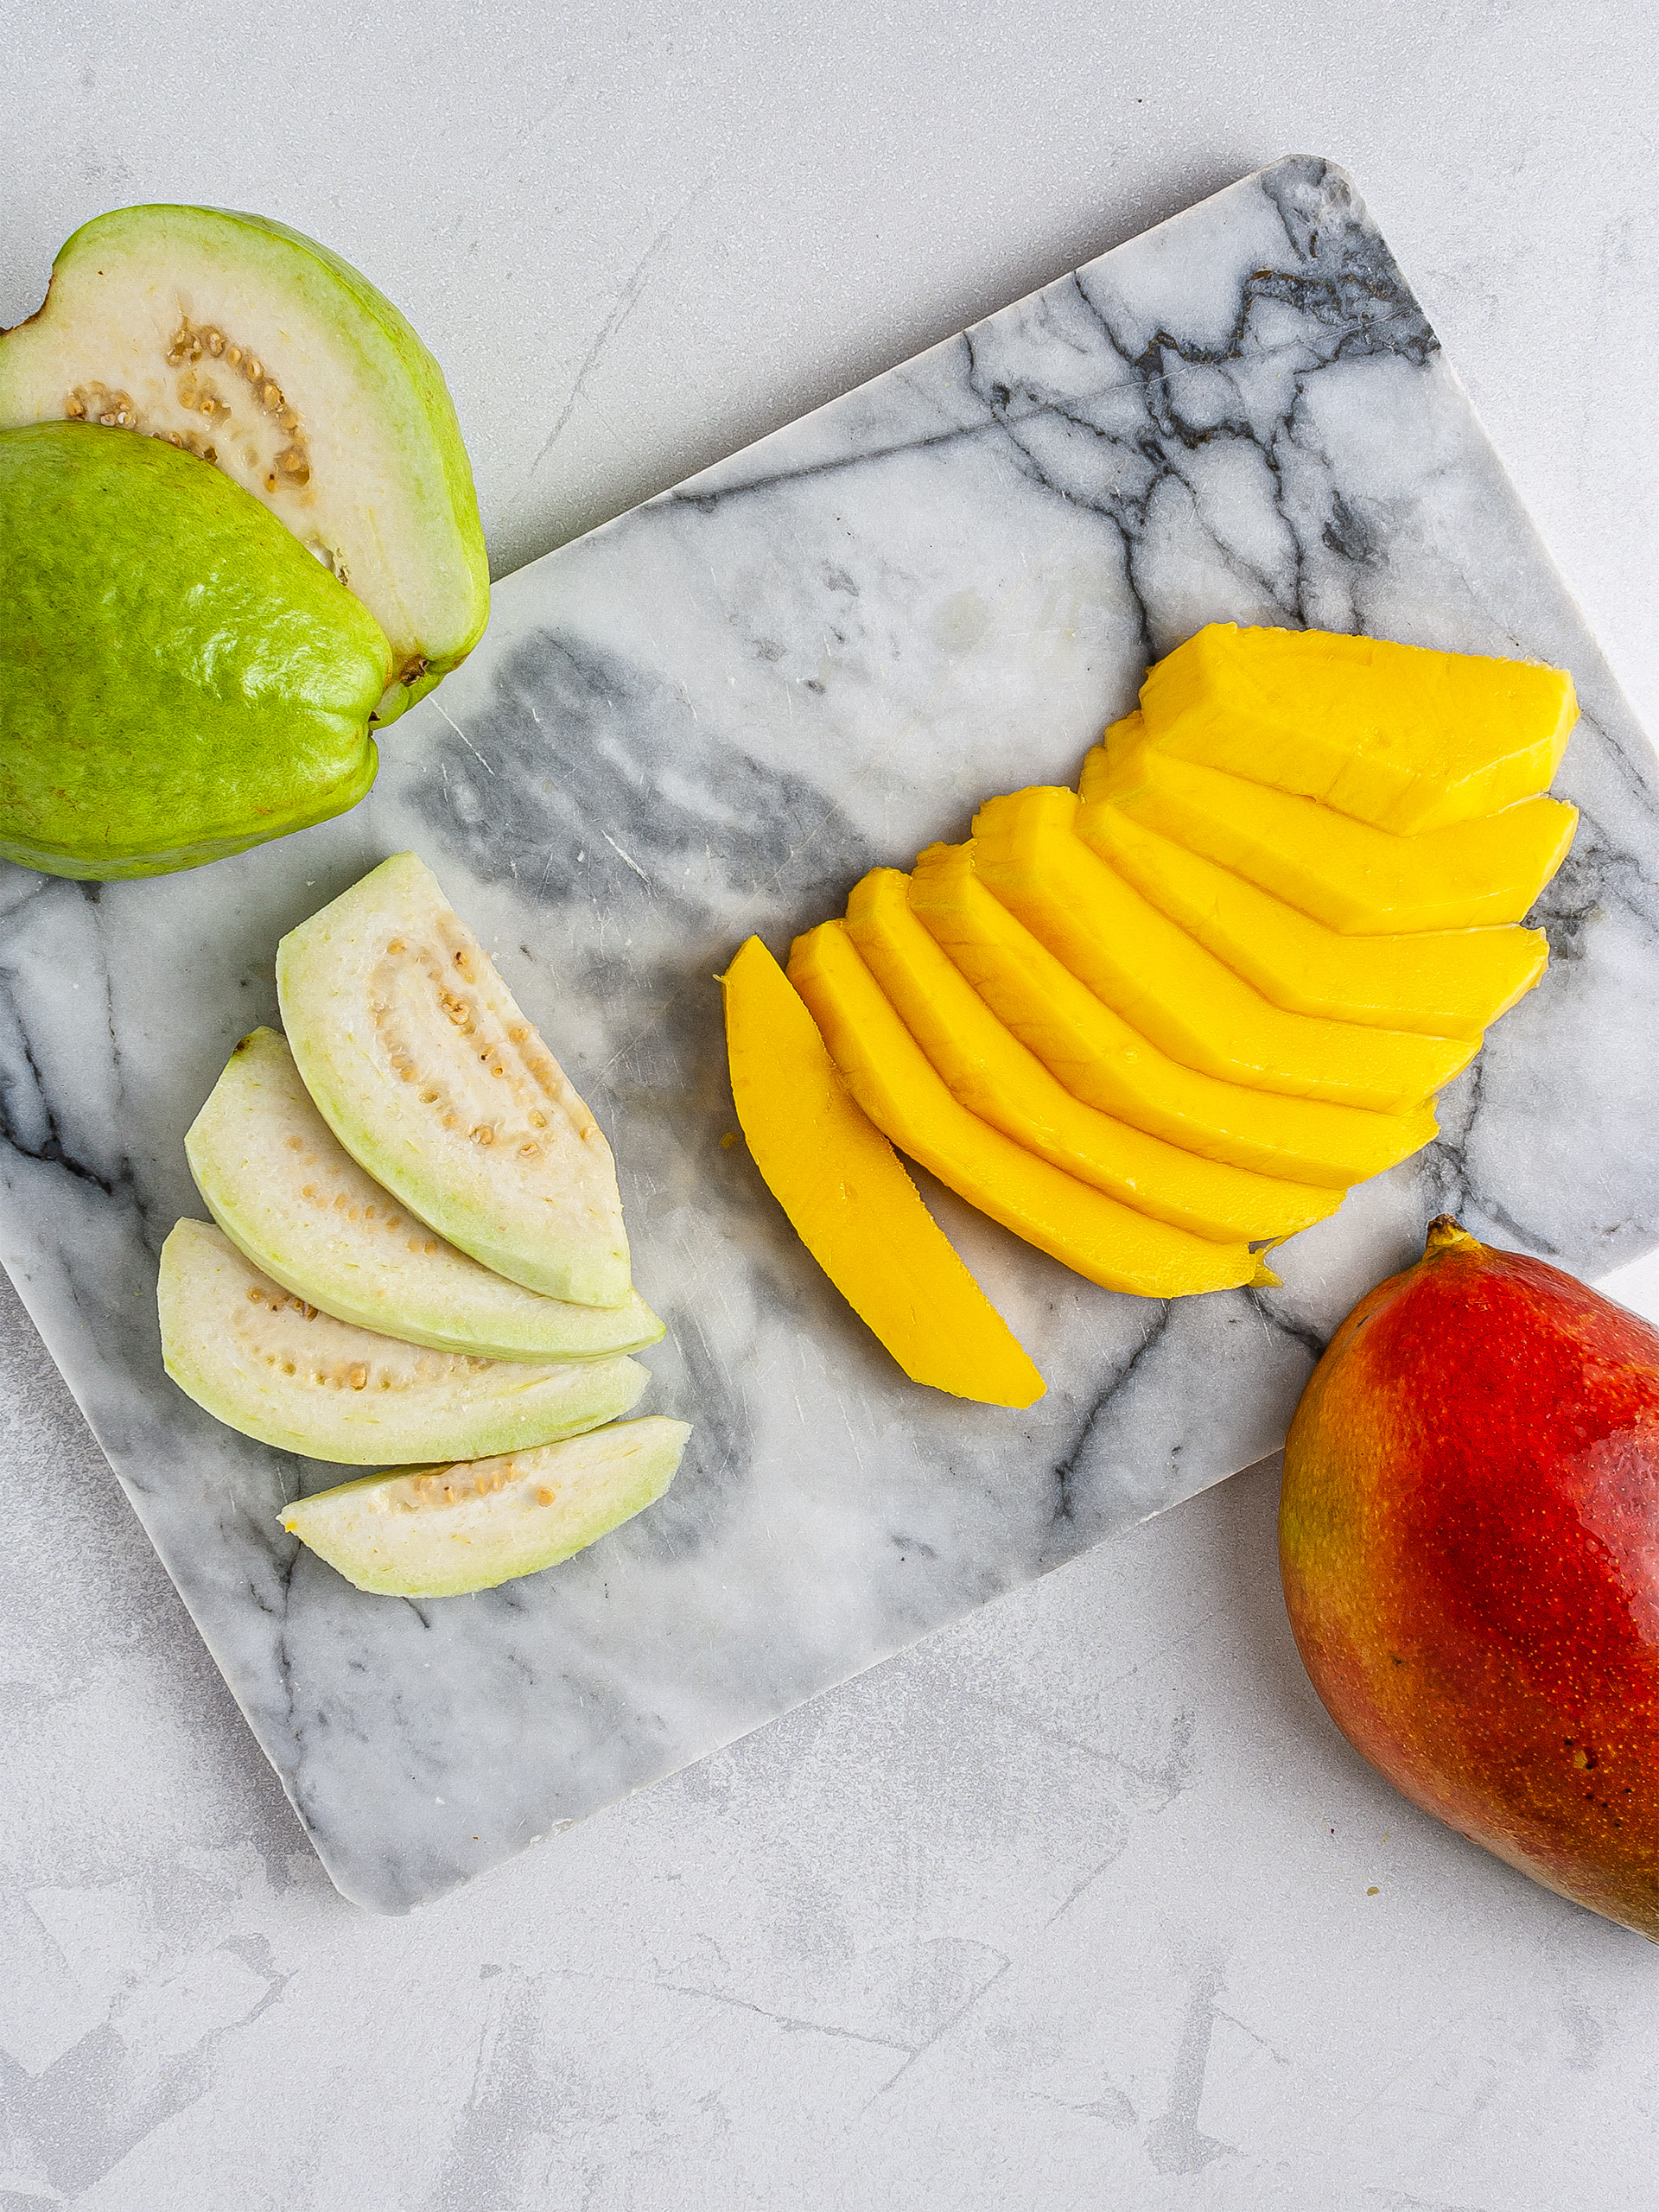 Sliced mango and guava